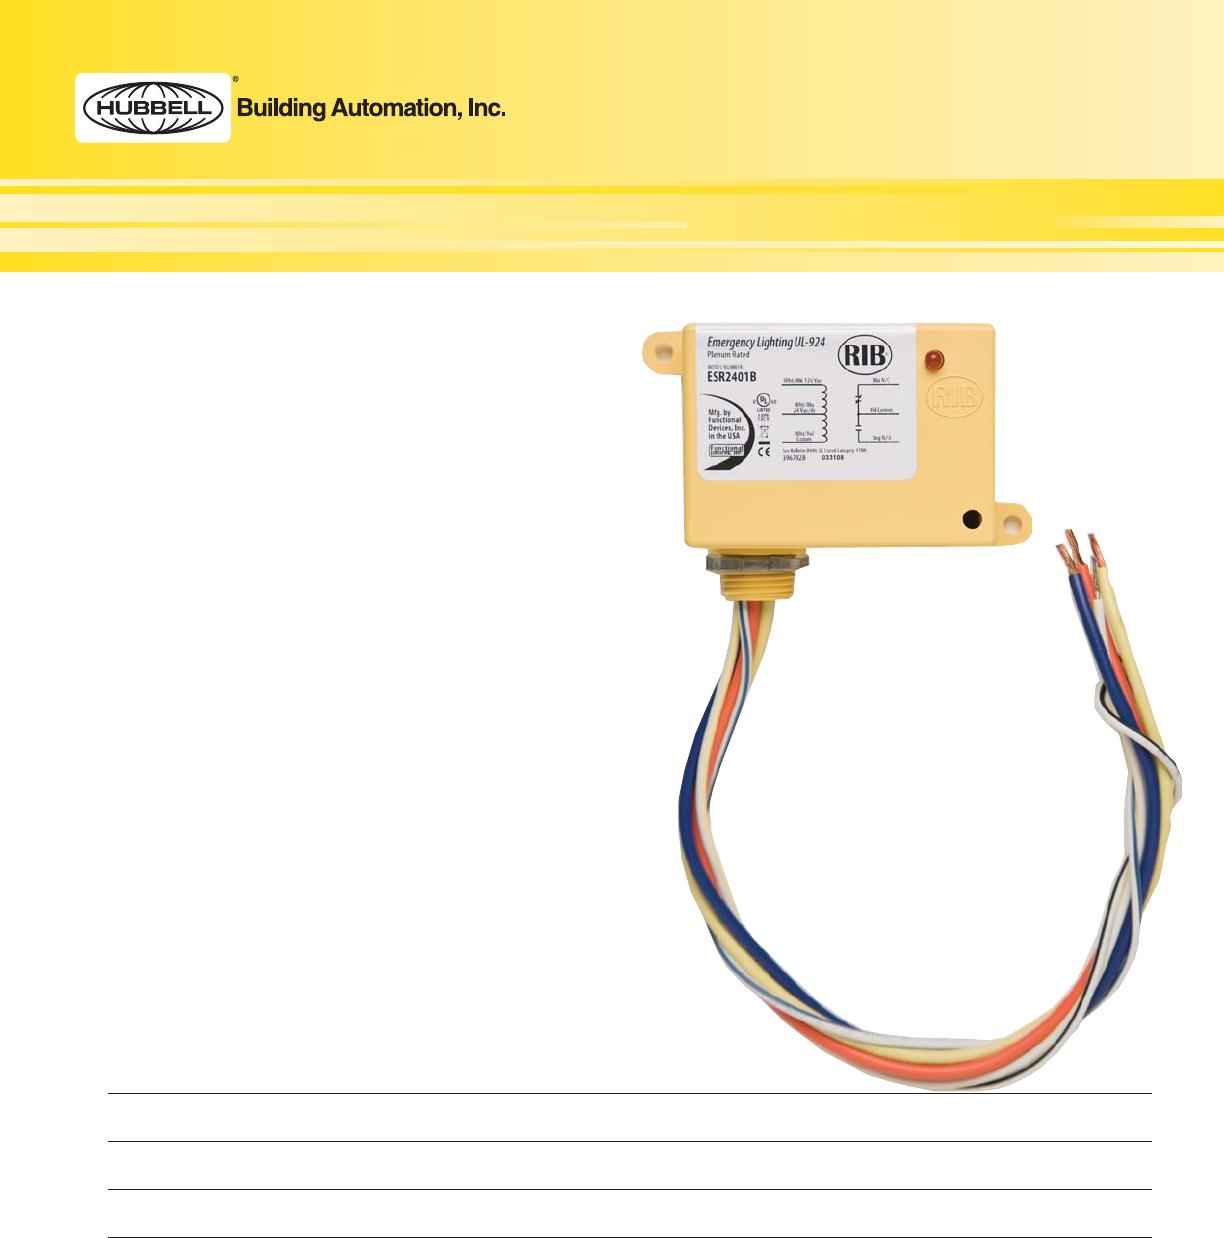 UL924cutsheet2009 Hba Ul924 Spec on ul 924 transfer relay, rib relay diagram, ul 924 bypass relay,